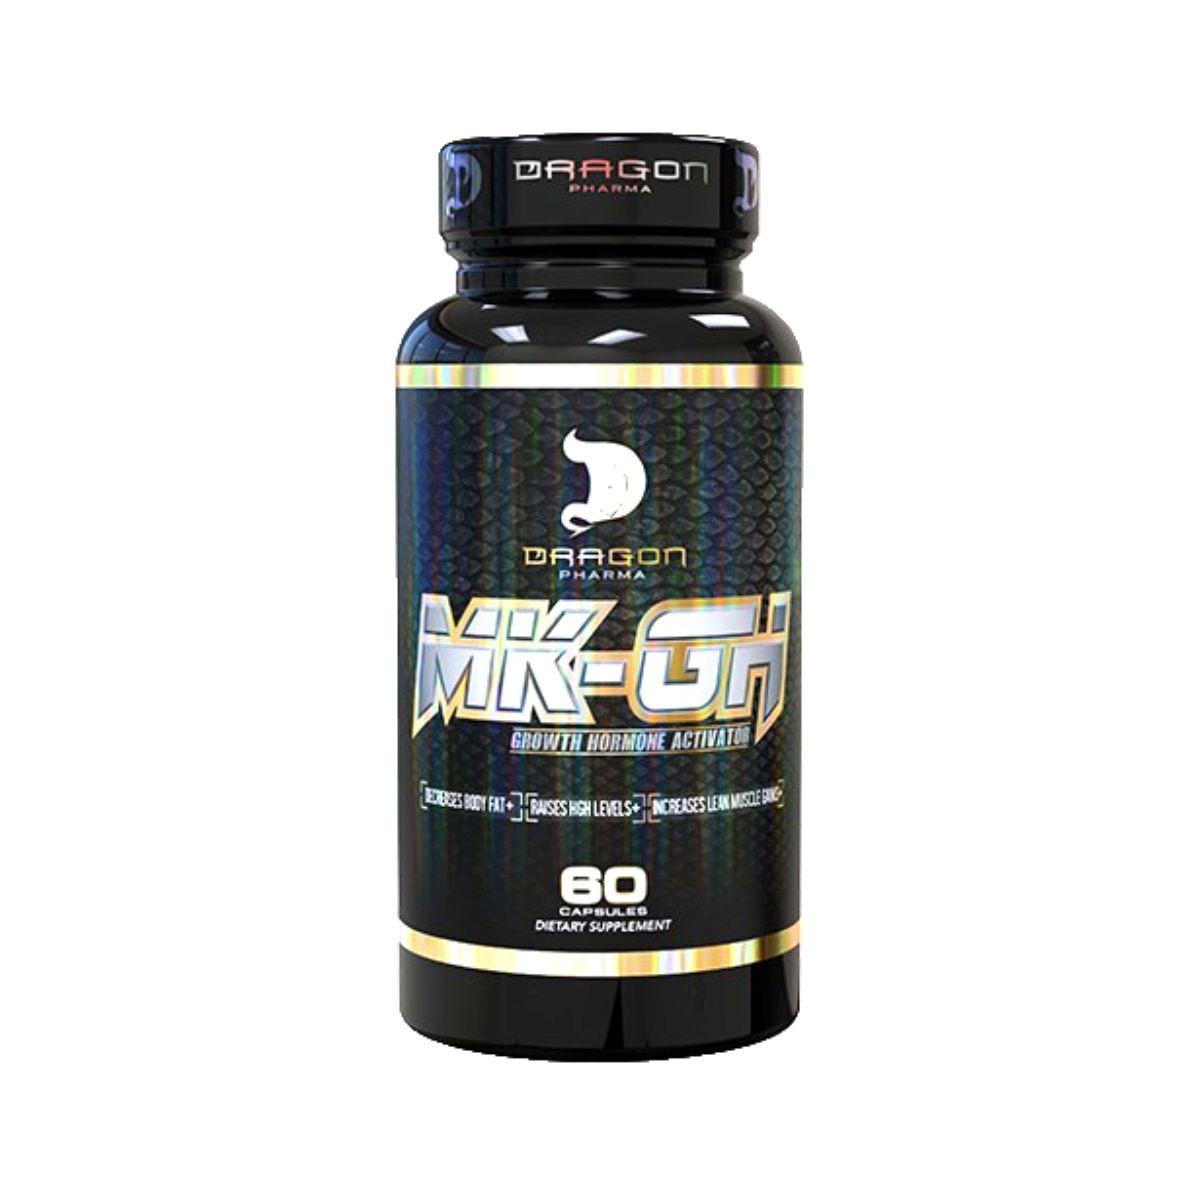 MK GH (MK677) 12,5mg 60 Caps - Dragon Pharma